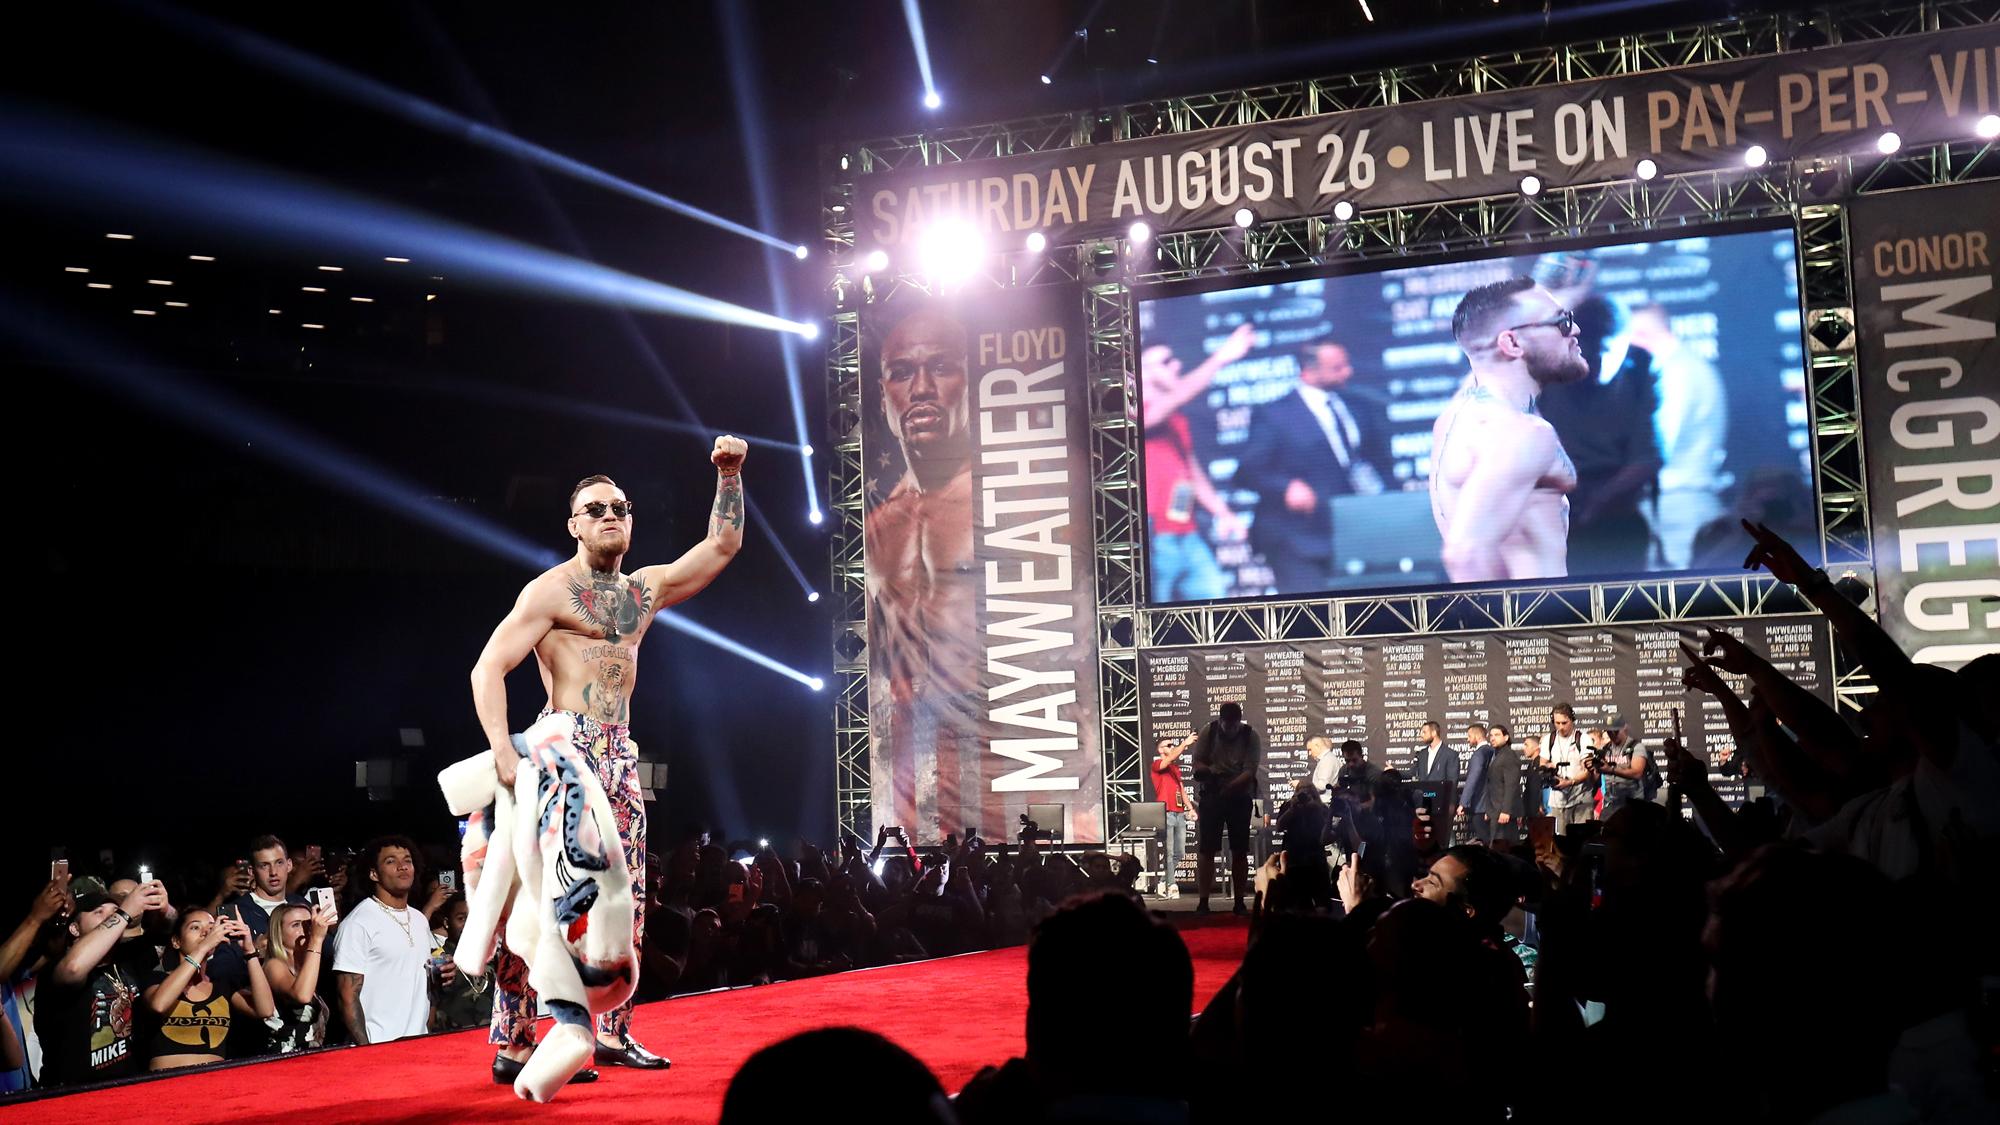 Floyd Mayweather Jr. v Conor McGregor World Press Tour – New York